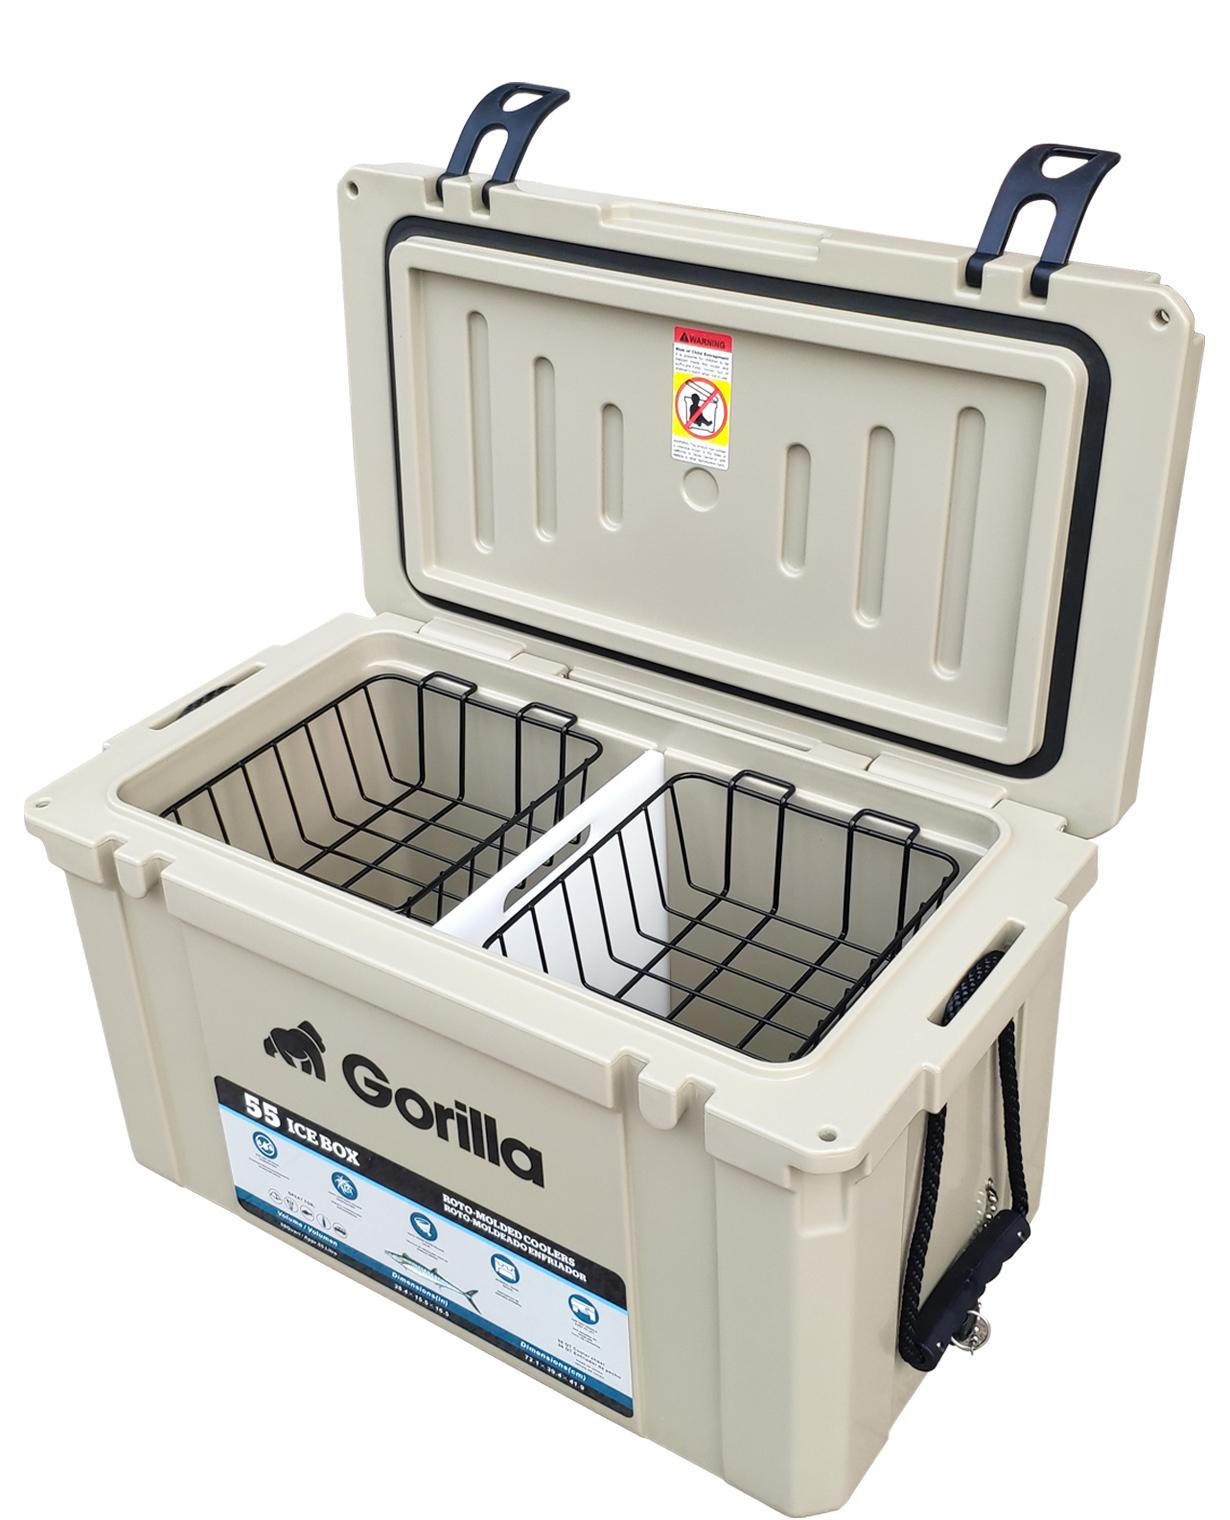 Gorilla: Heavy Duty Ice Box Chilly Bin 55L image